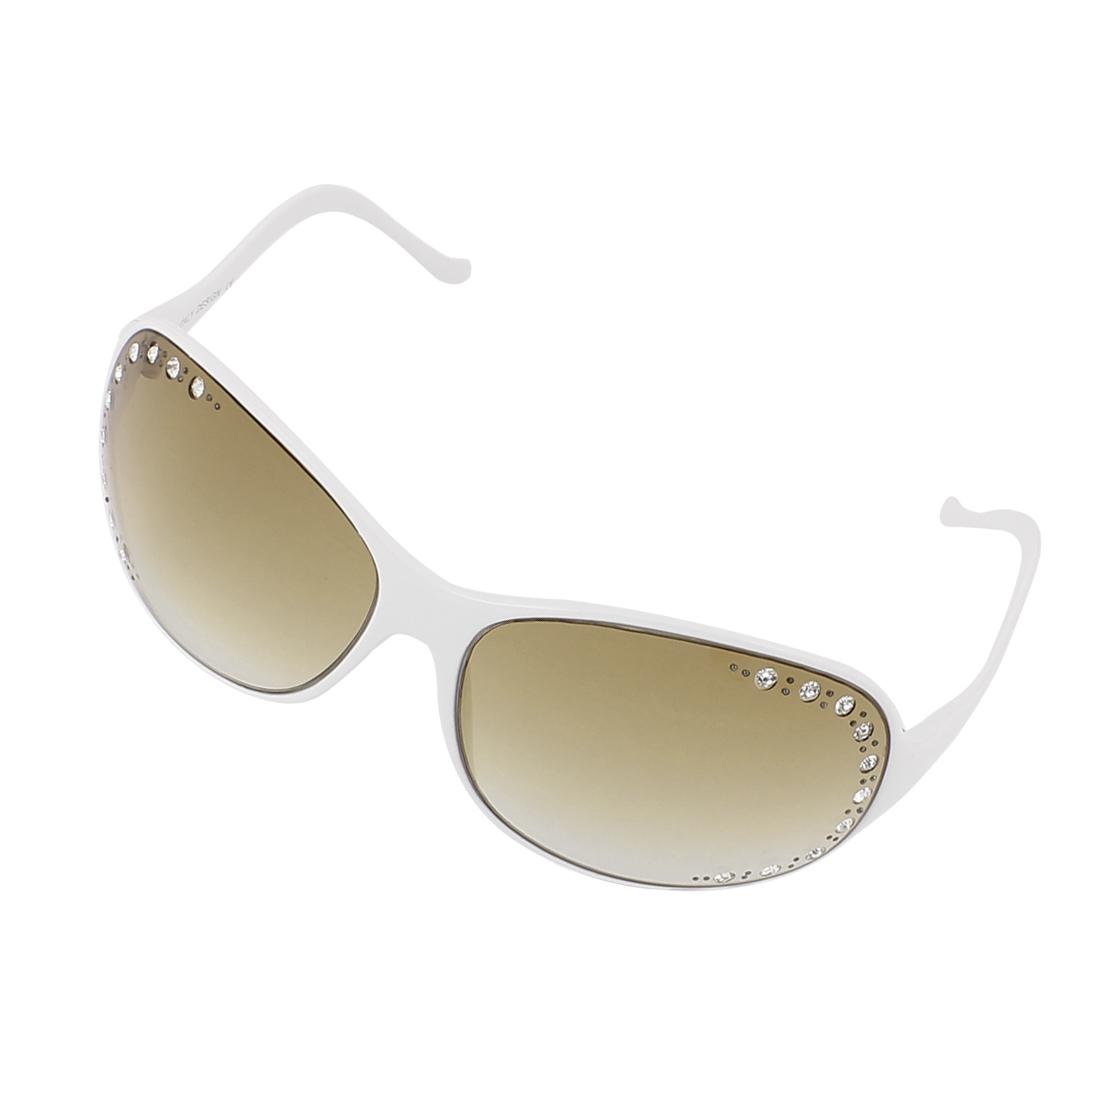 Lady Rhinestone Decor Shades Slim Rim Sunglasses Eyewear Glasses White